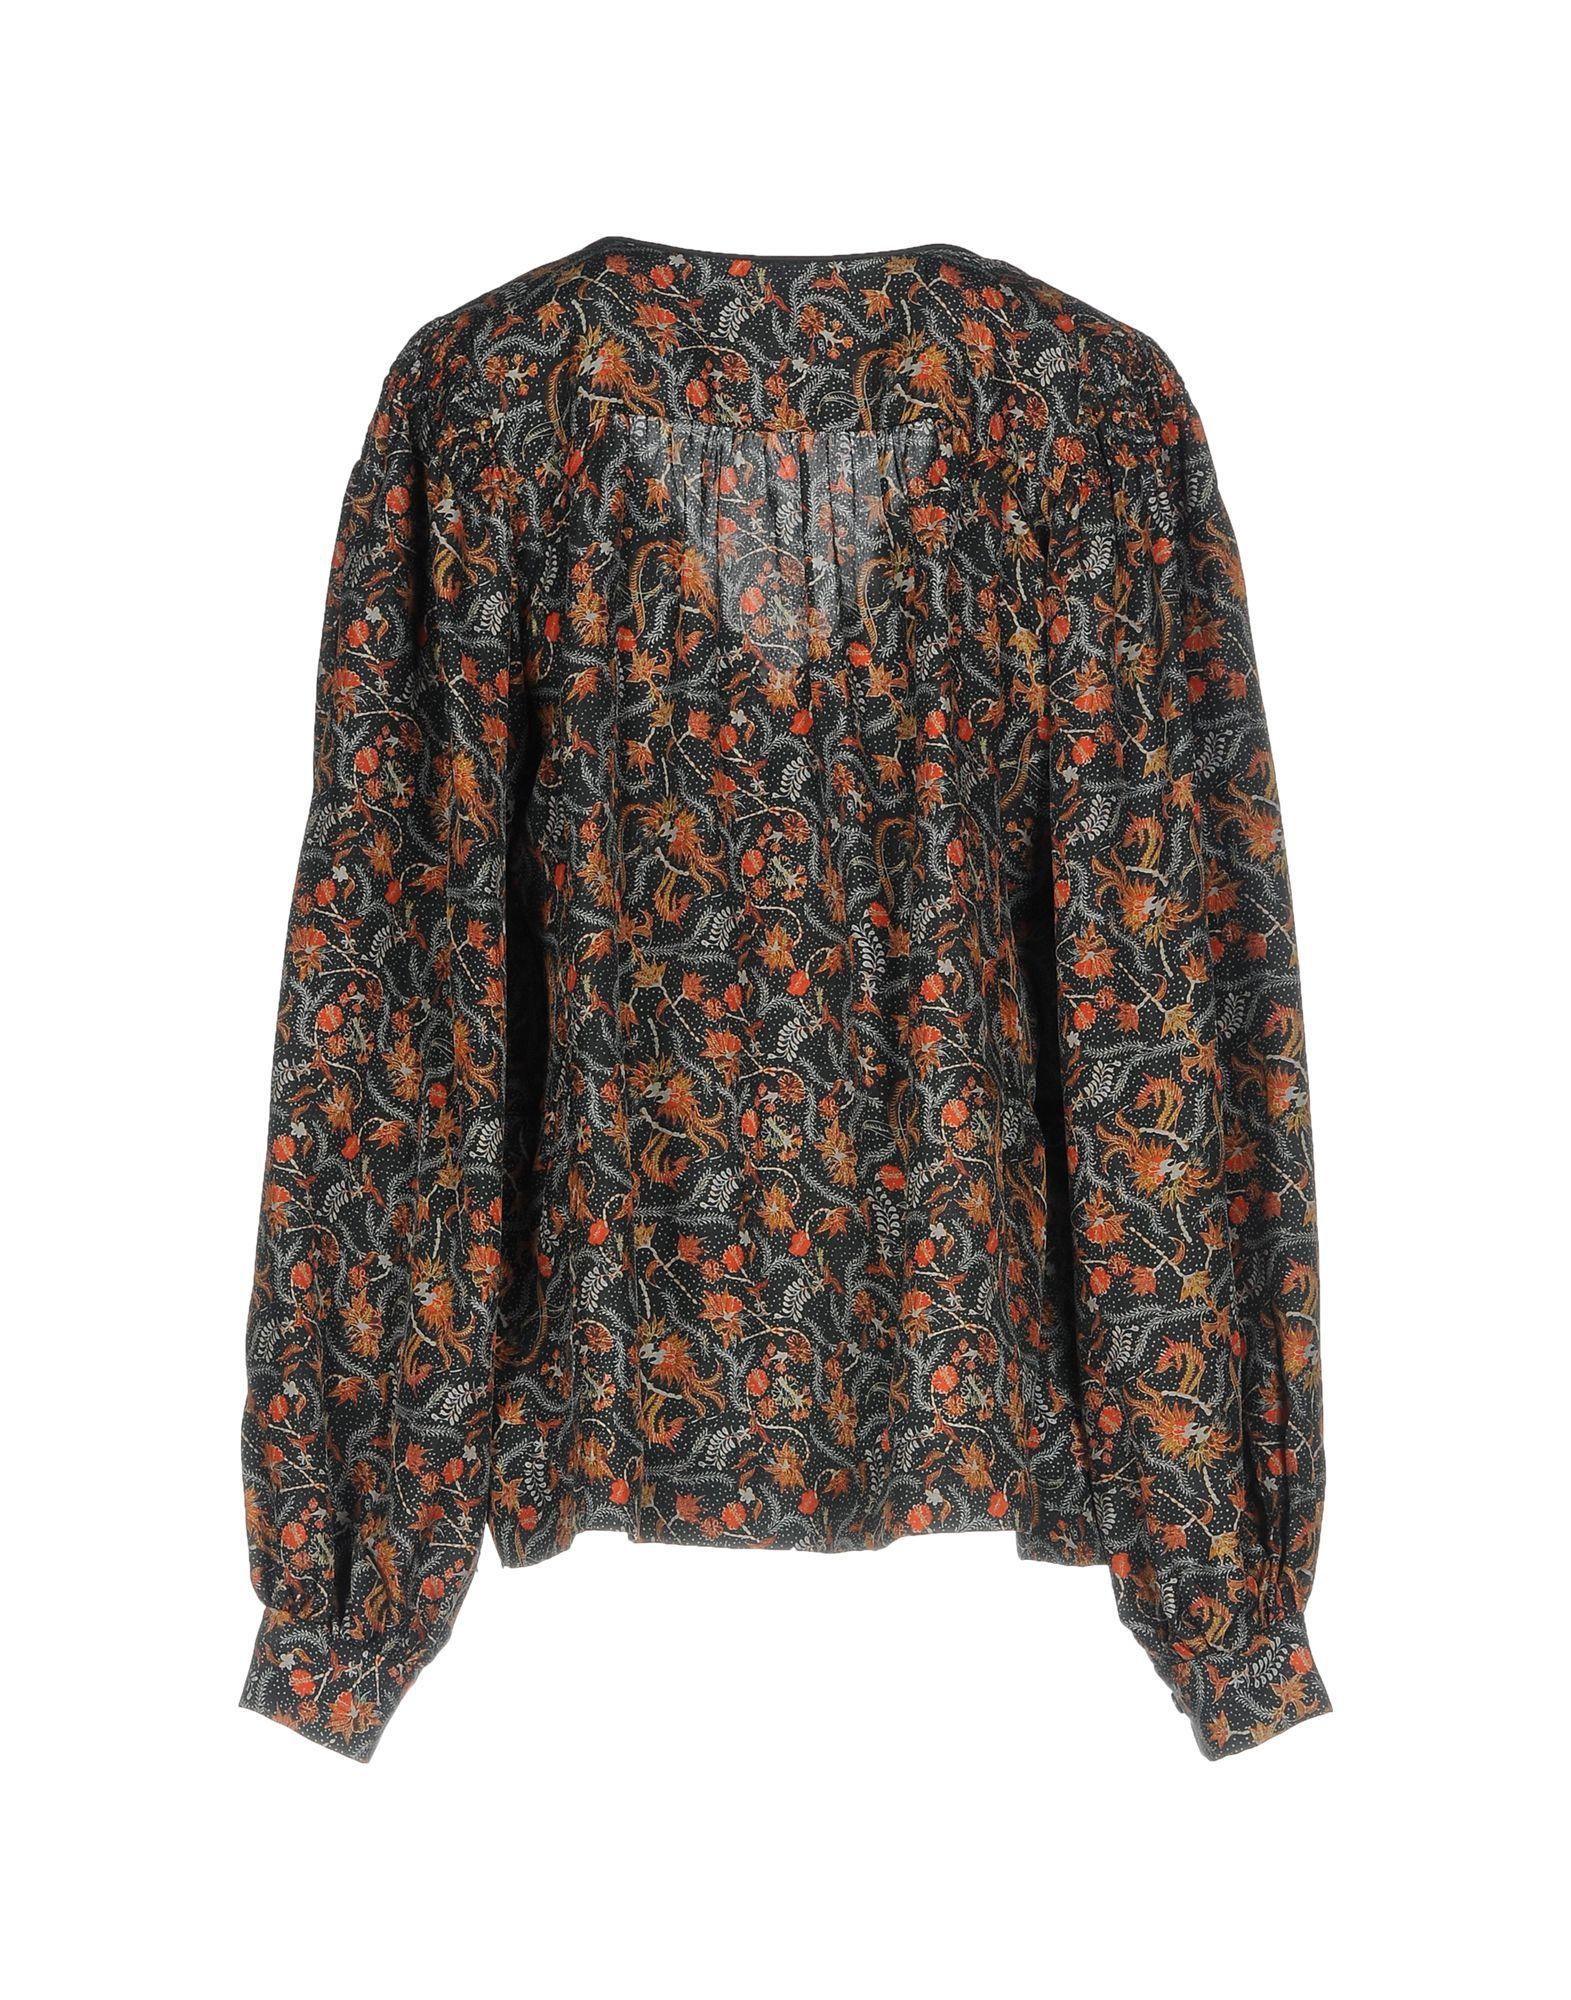 Isabel Marant Lead Print Silk Blouse